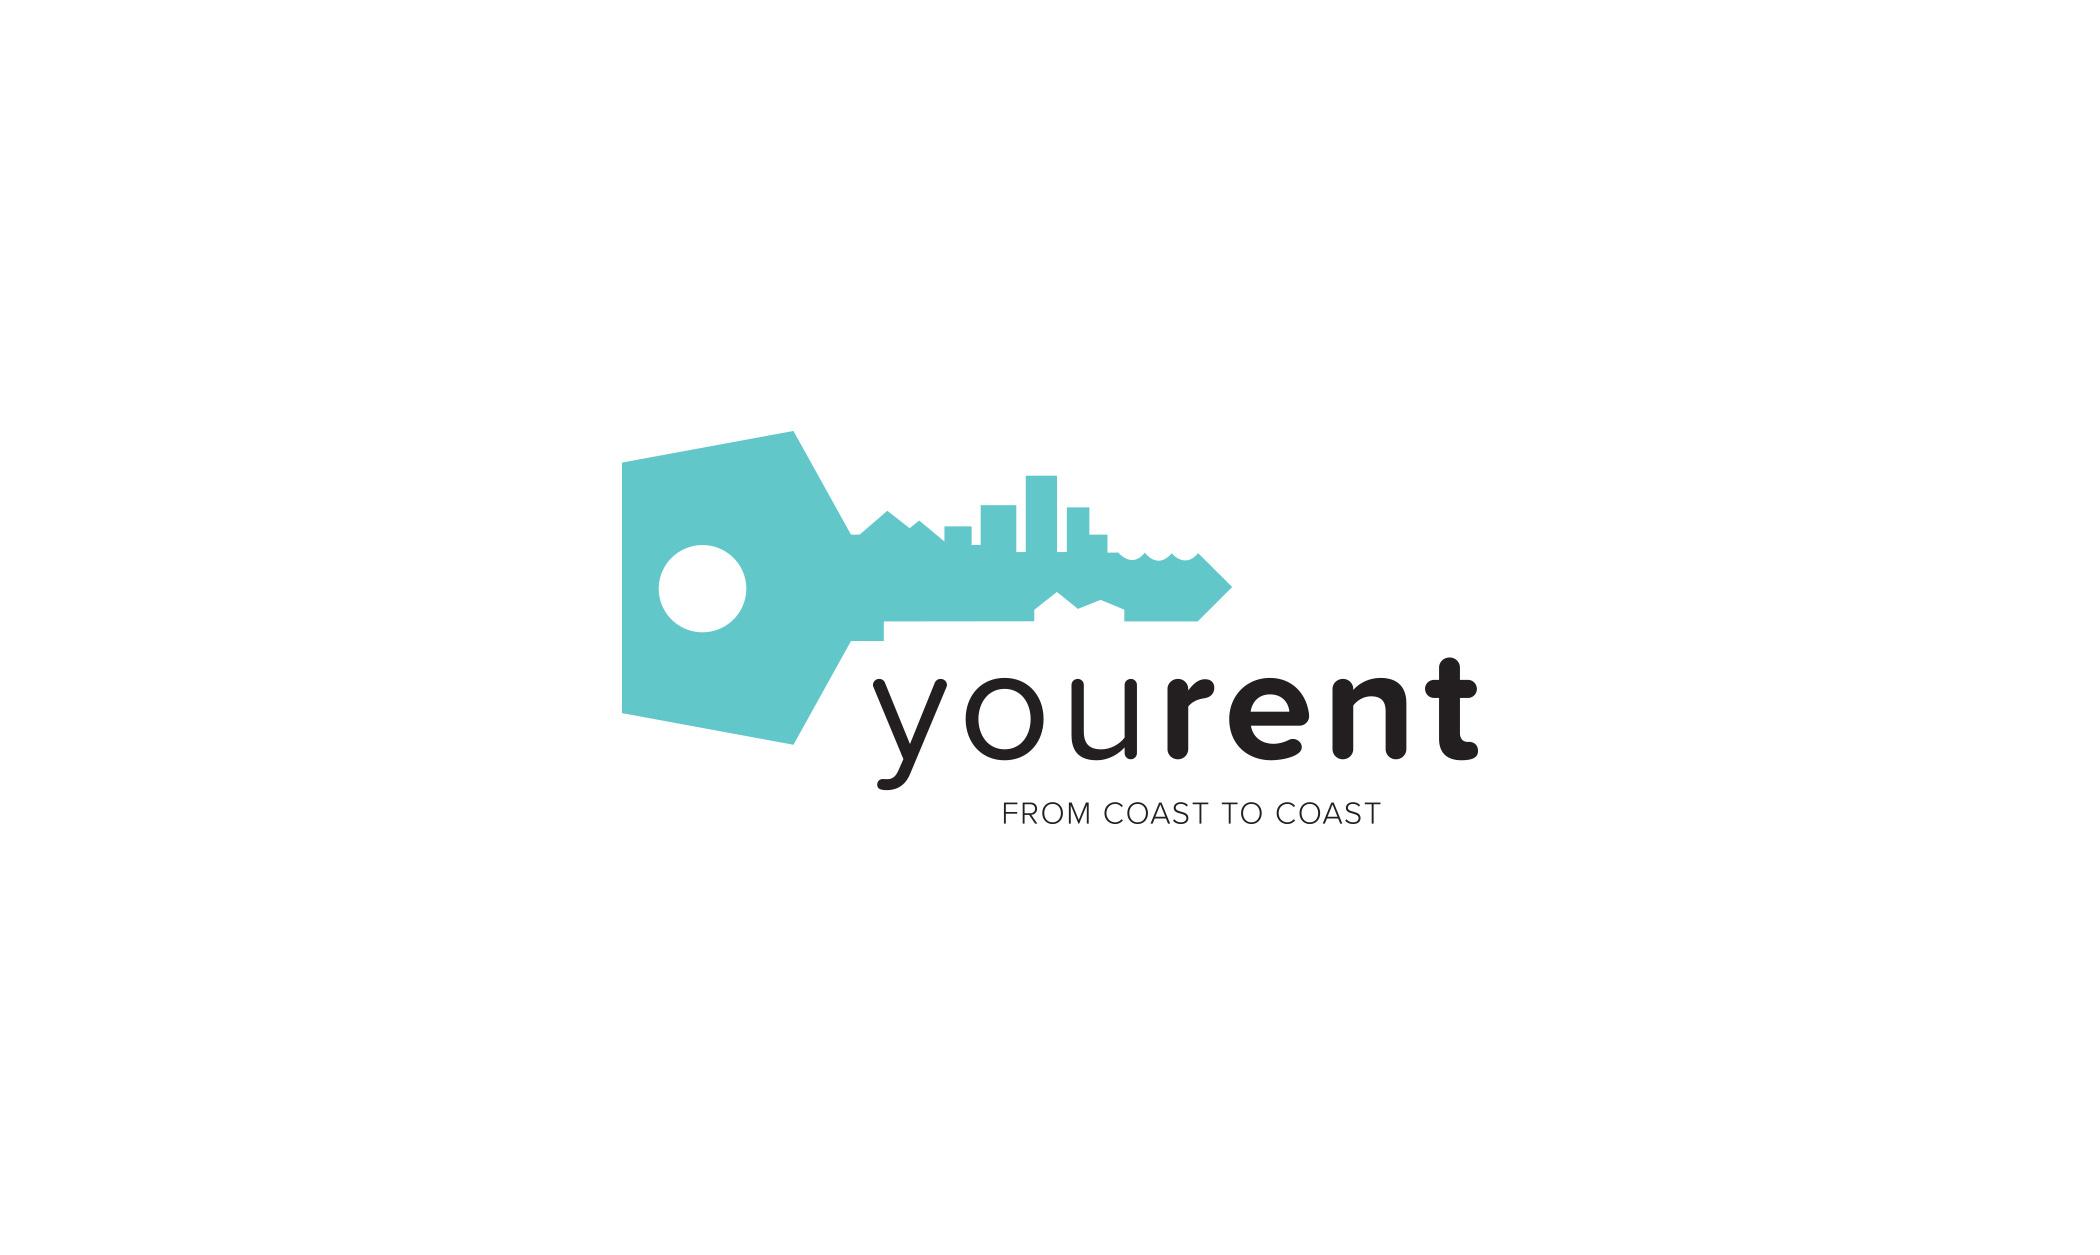 yourent_logo2.jpg